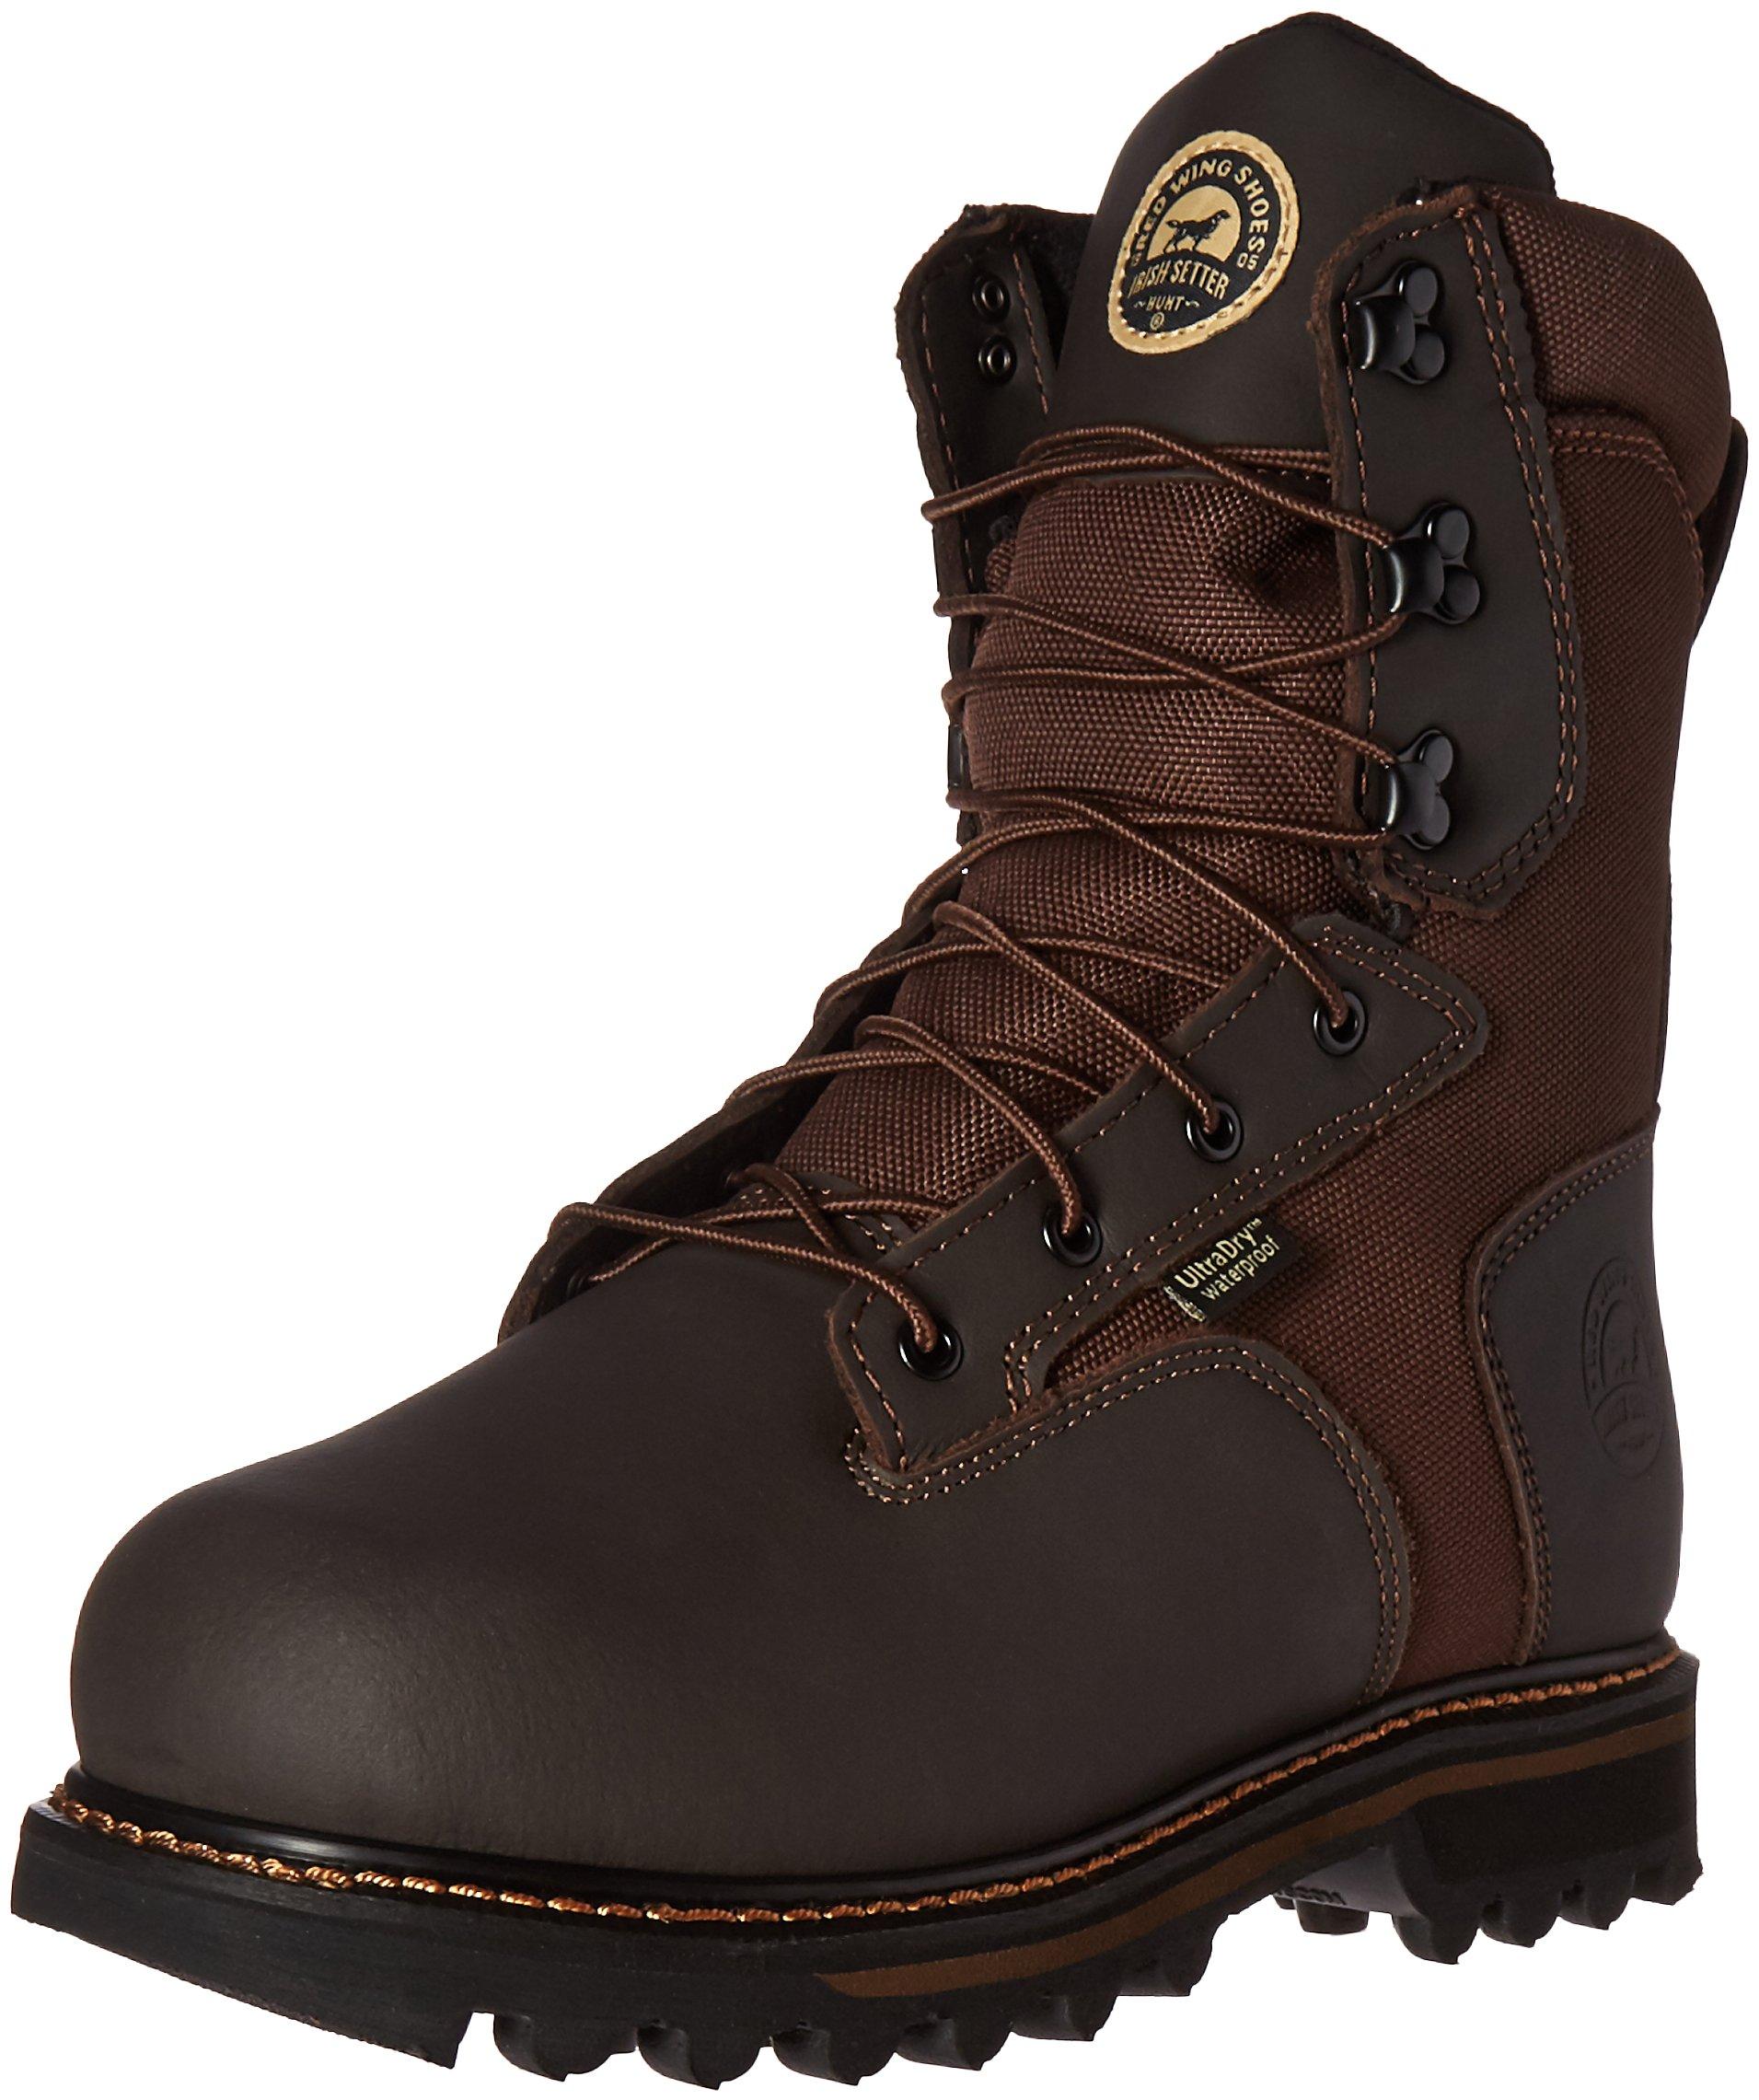 Irish Setter Men's Gunflint II 2812 800 Gram Hunting Boot, Brown, 13 D US